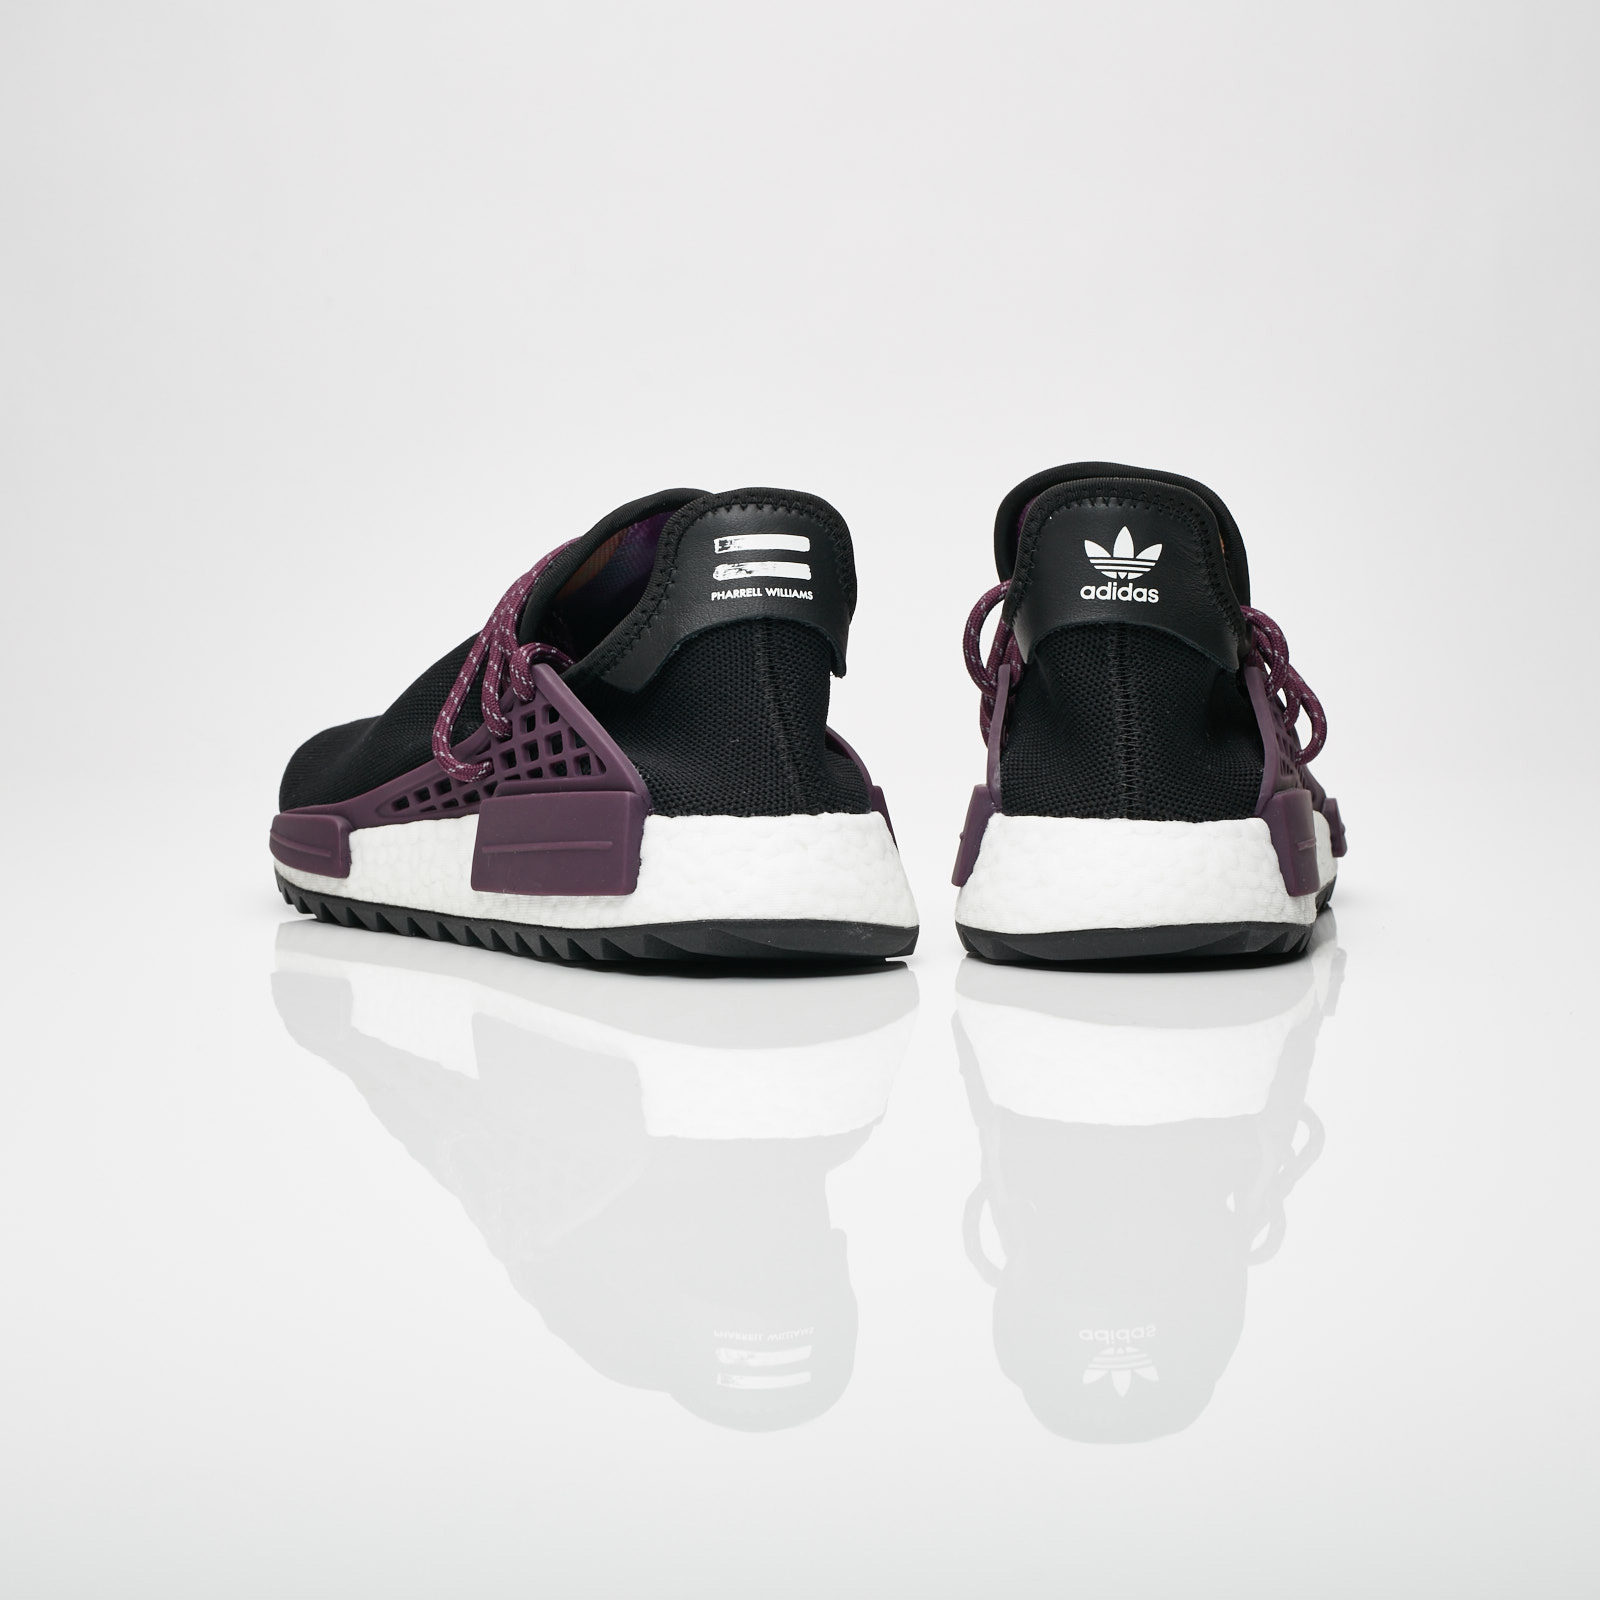 782c8e234 adidas Pharrell Williams HU Holi NMD MC - Ac7033 - Sneakersnstuff ...  pharrell x